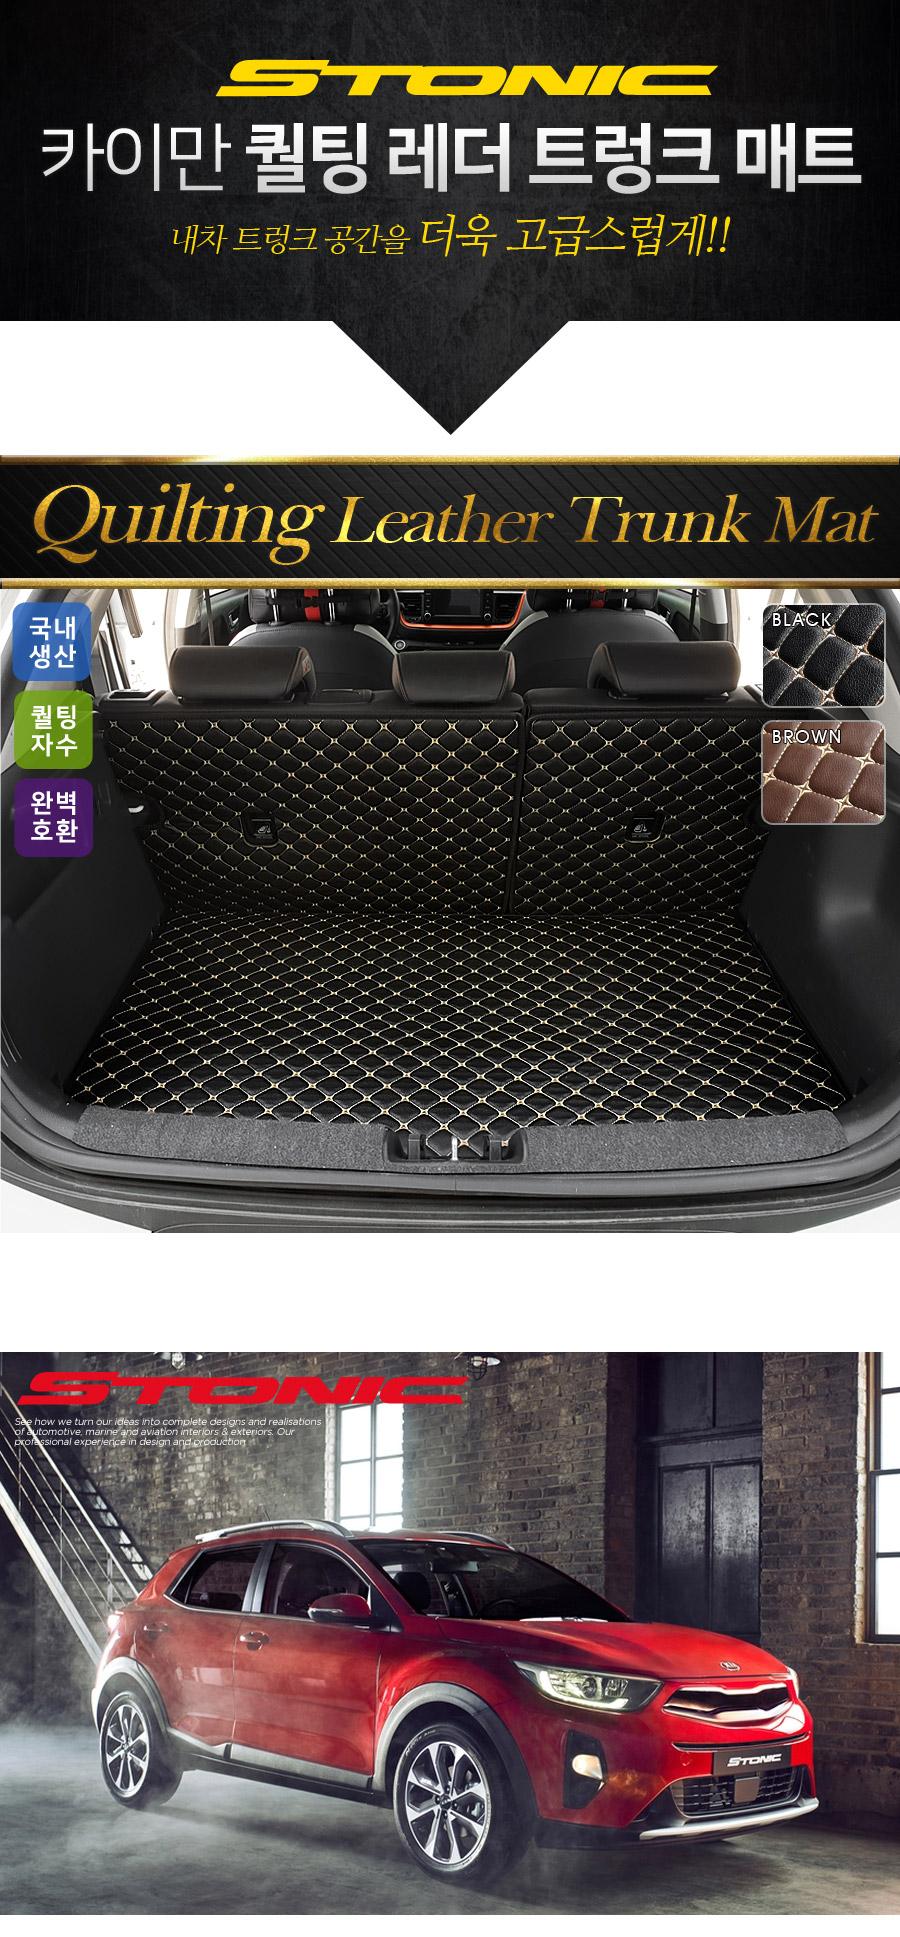 stonic-quilting-trunk-mat_01.jpg